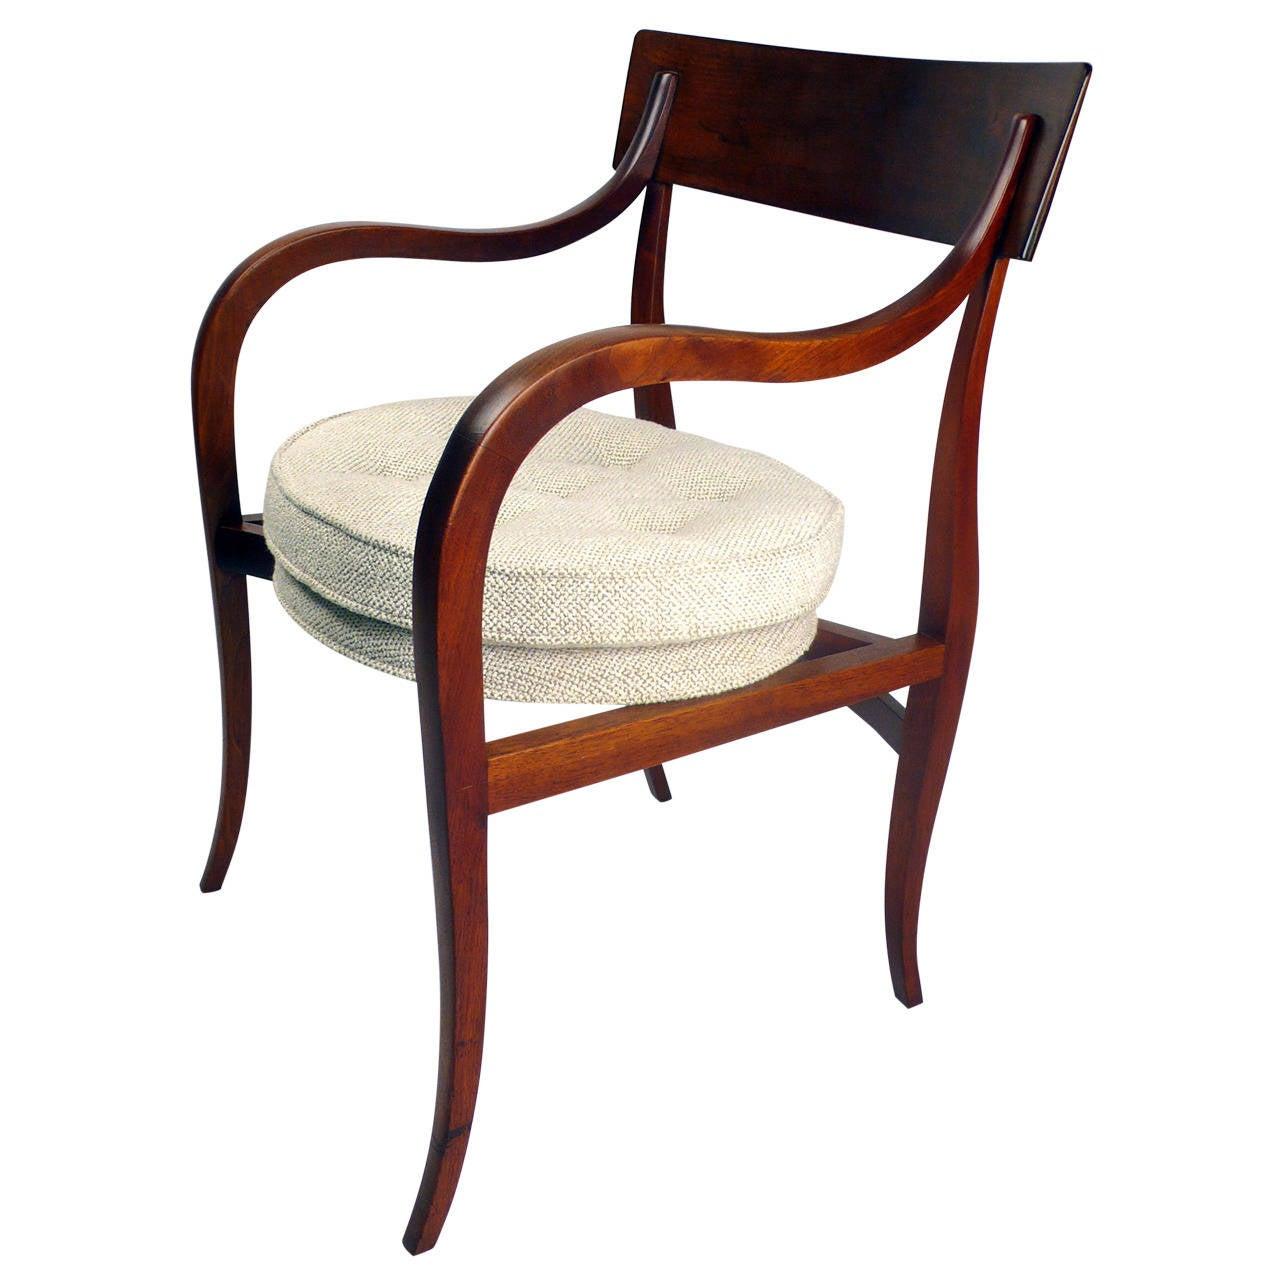 Edward wormley alexandria chair at 1stdibs - Edward wormley chairs ...